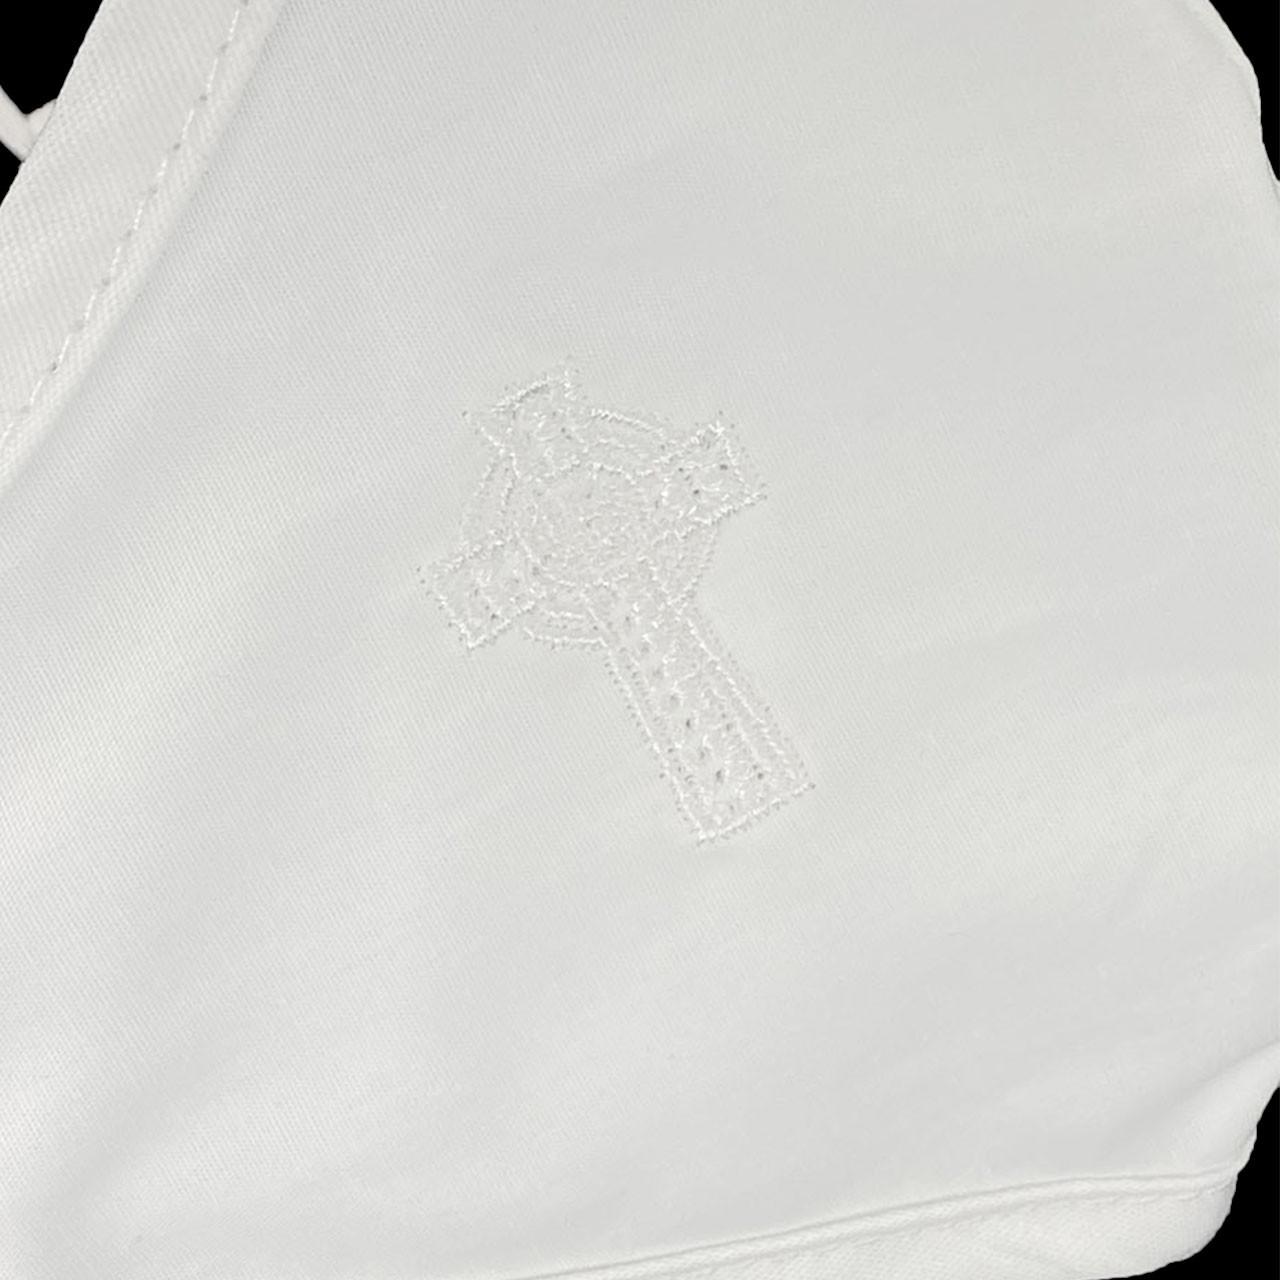 Celtic Cross Face Mask detail of embroidered Celtic Cross